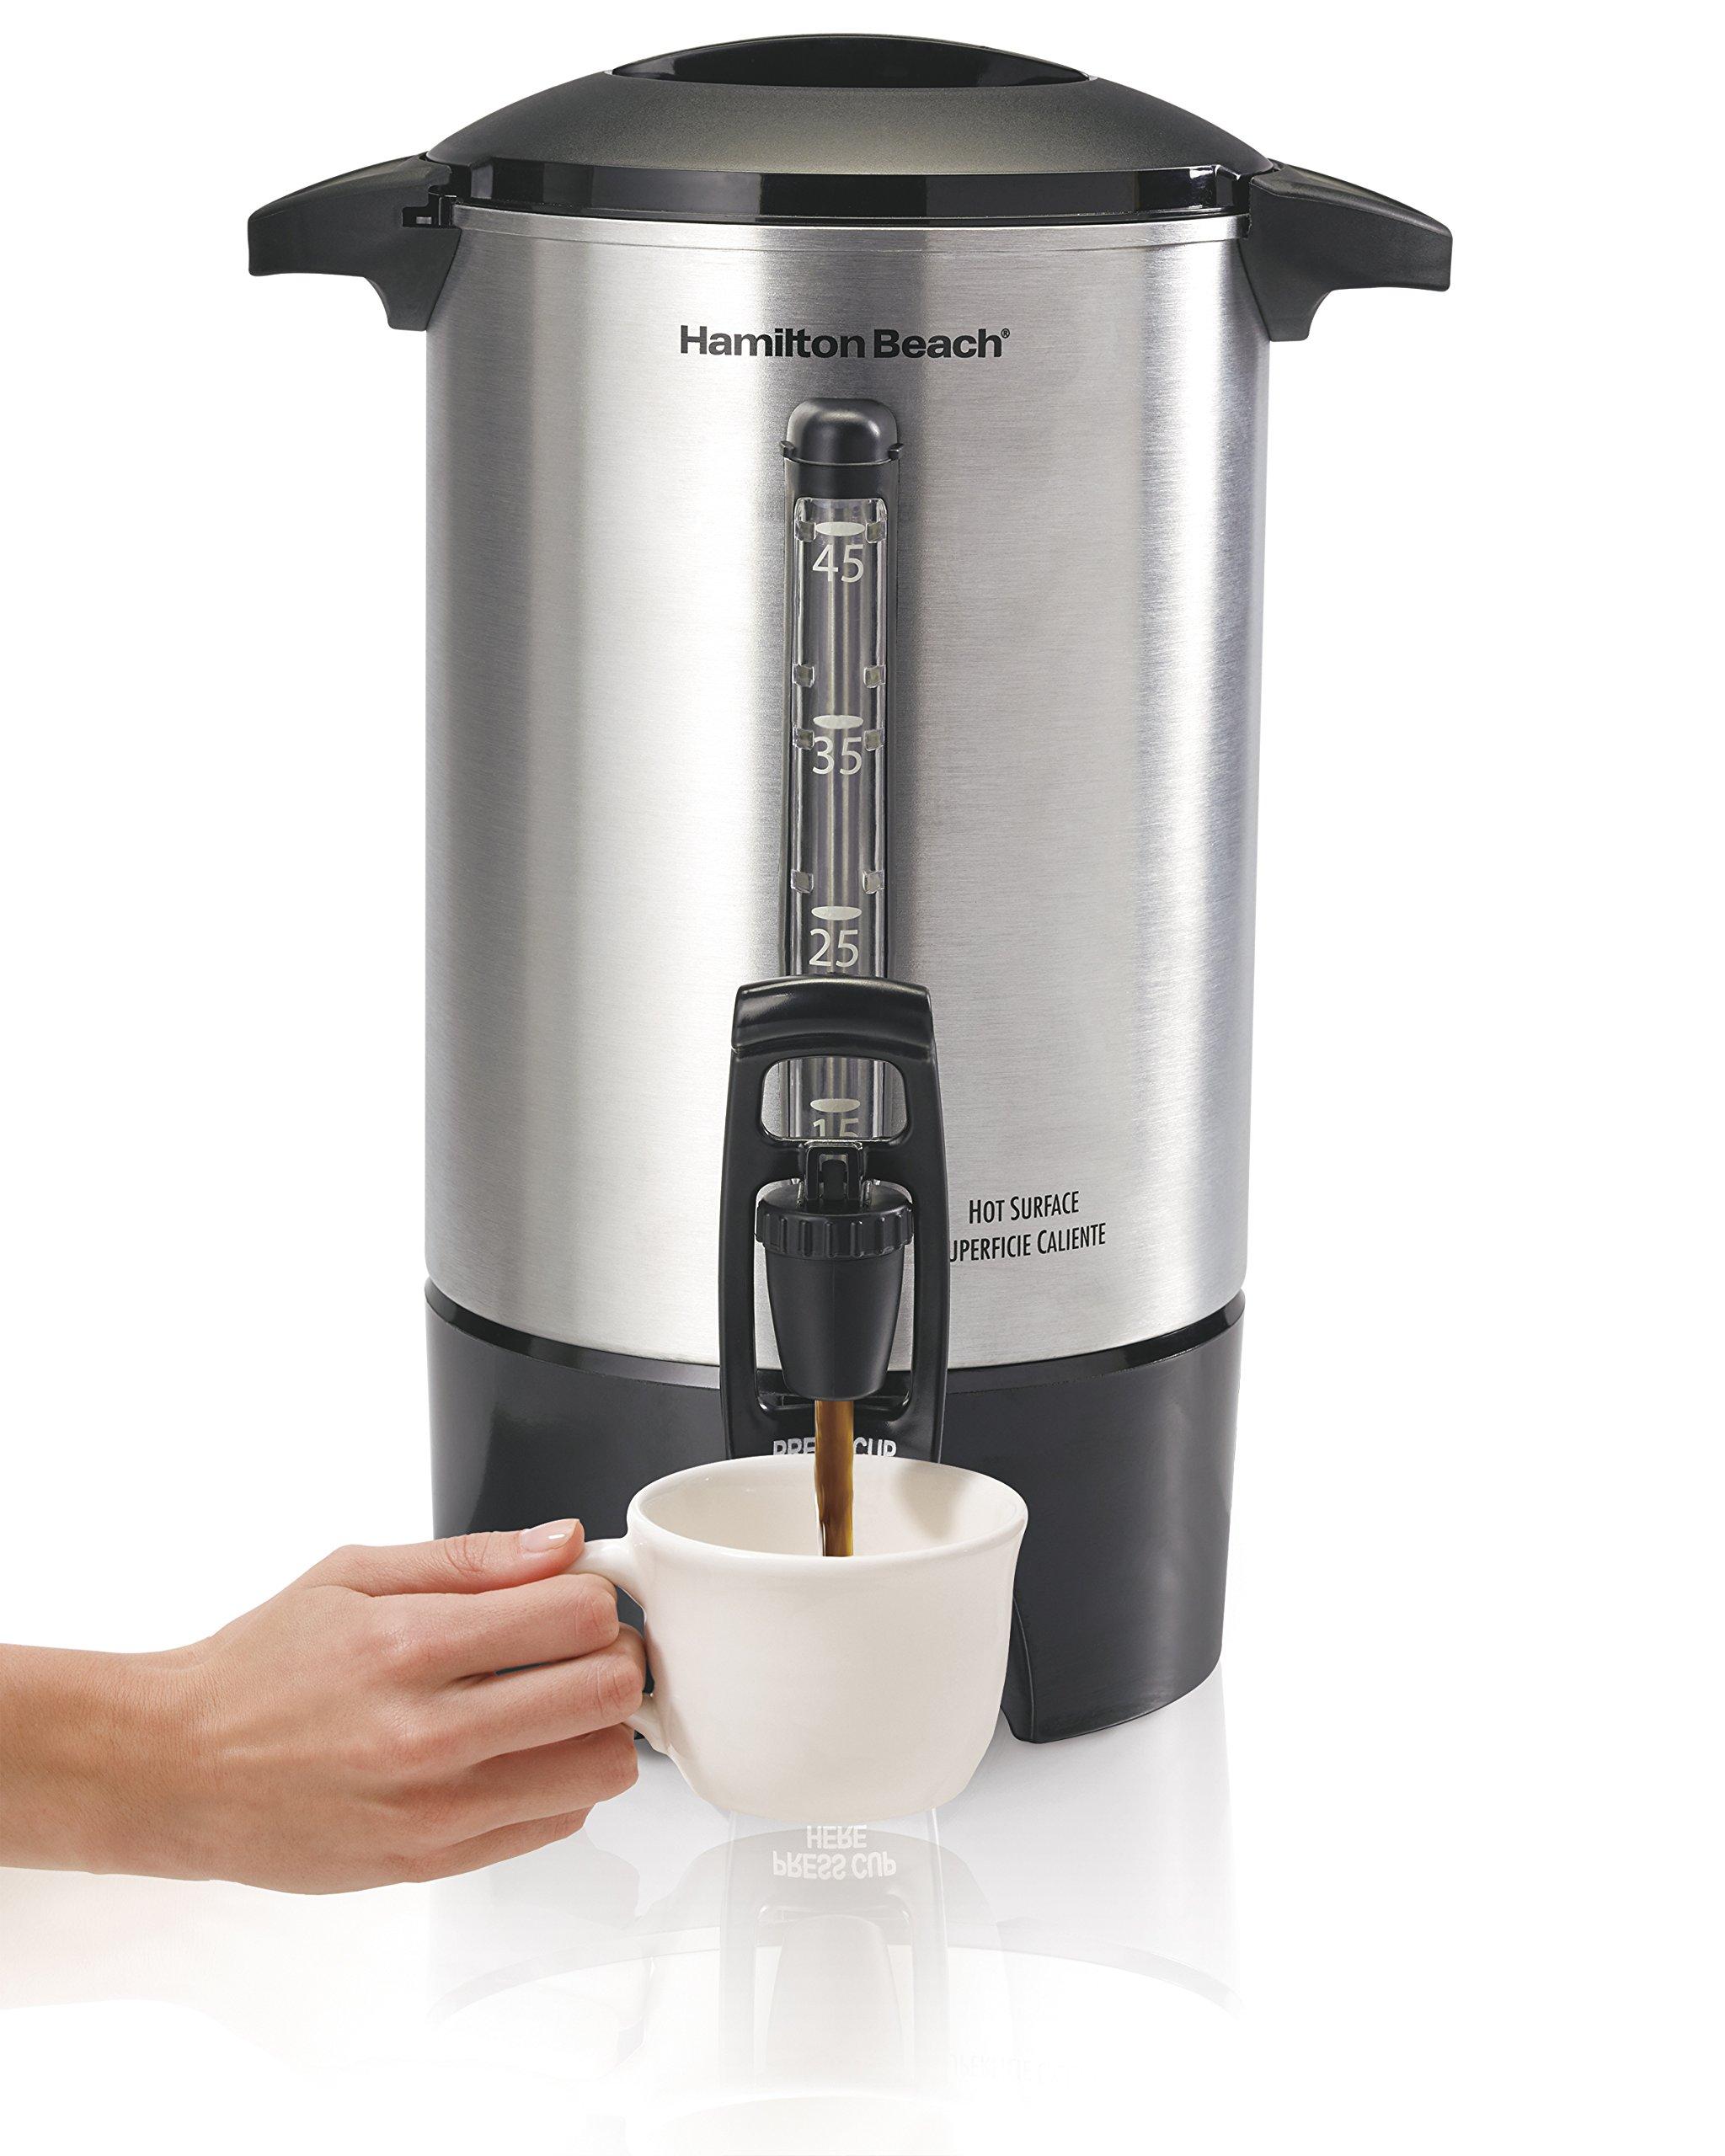 Hamilton Beach 40519 Coffee Urn, 45 Cup, Stainless Steel